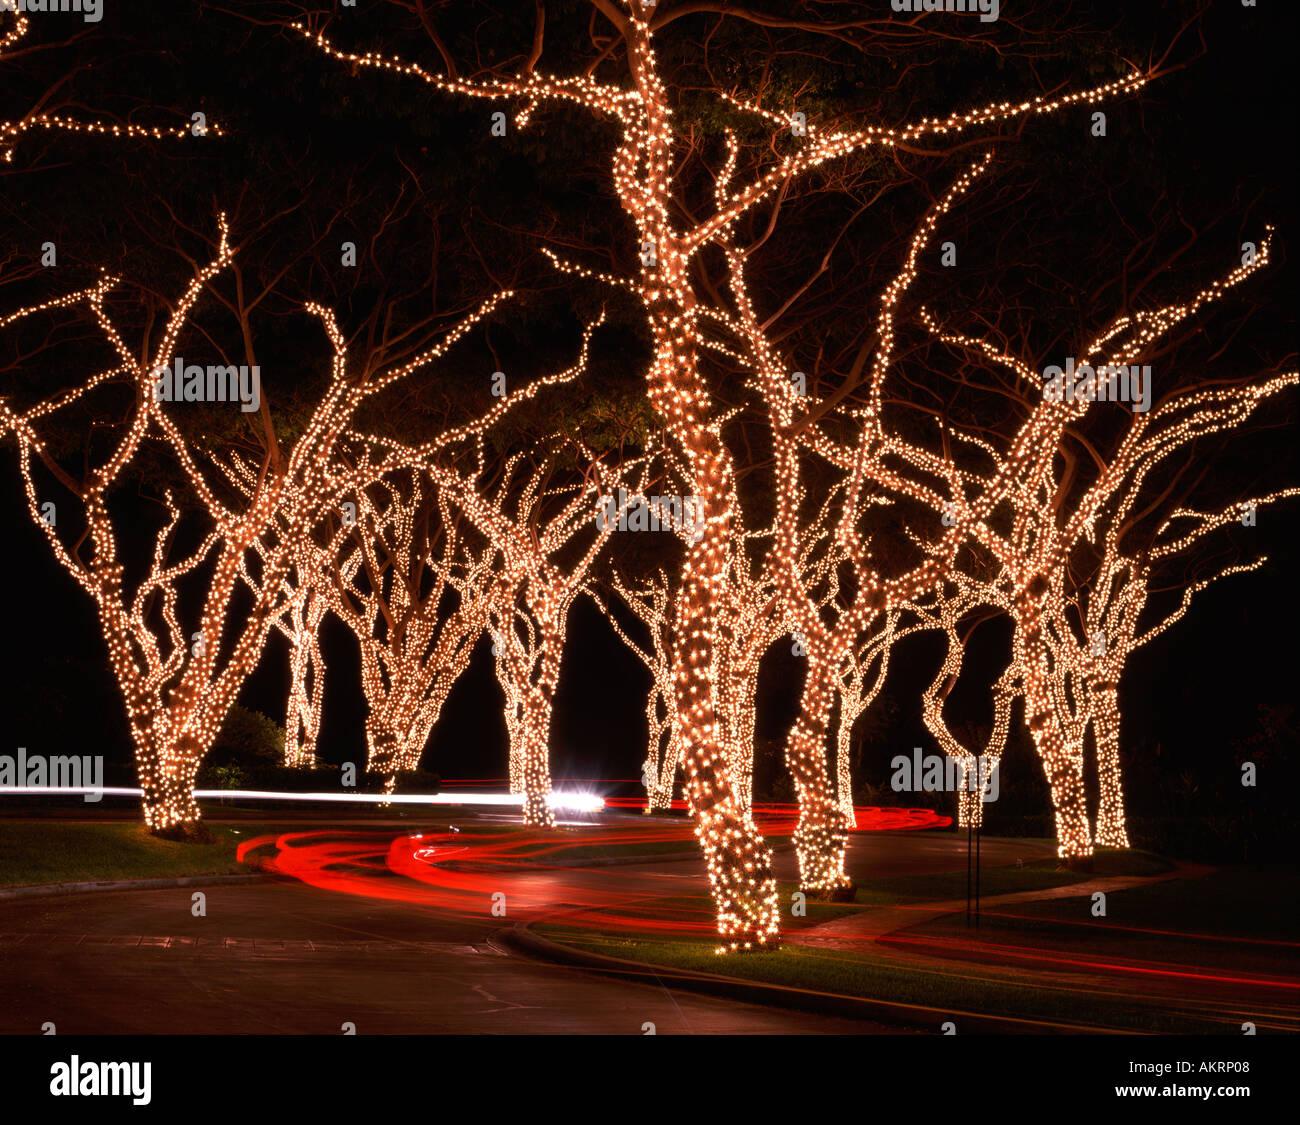 Driveway with Christmas lights on trees Stock Photo: 4917767 - Alamy